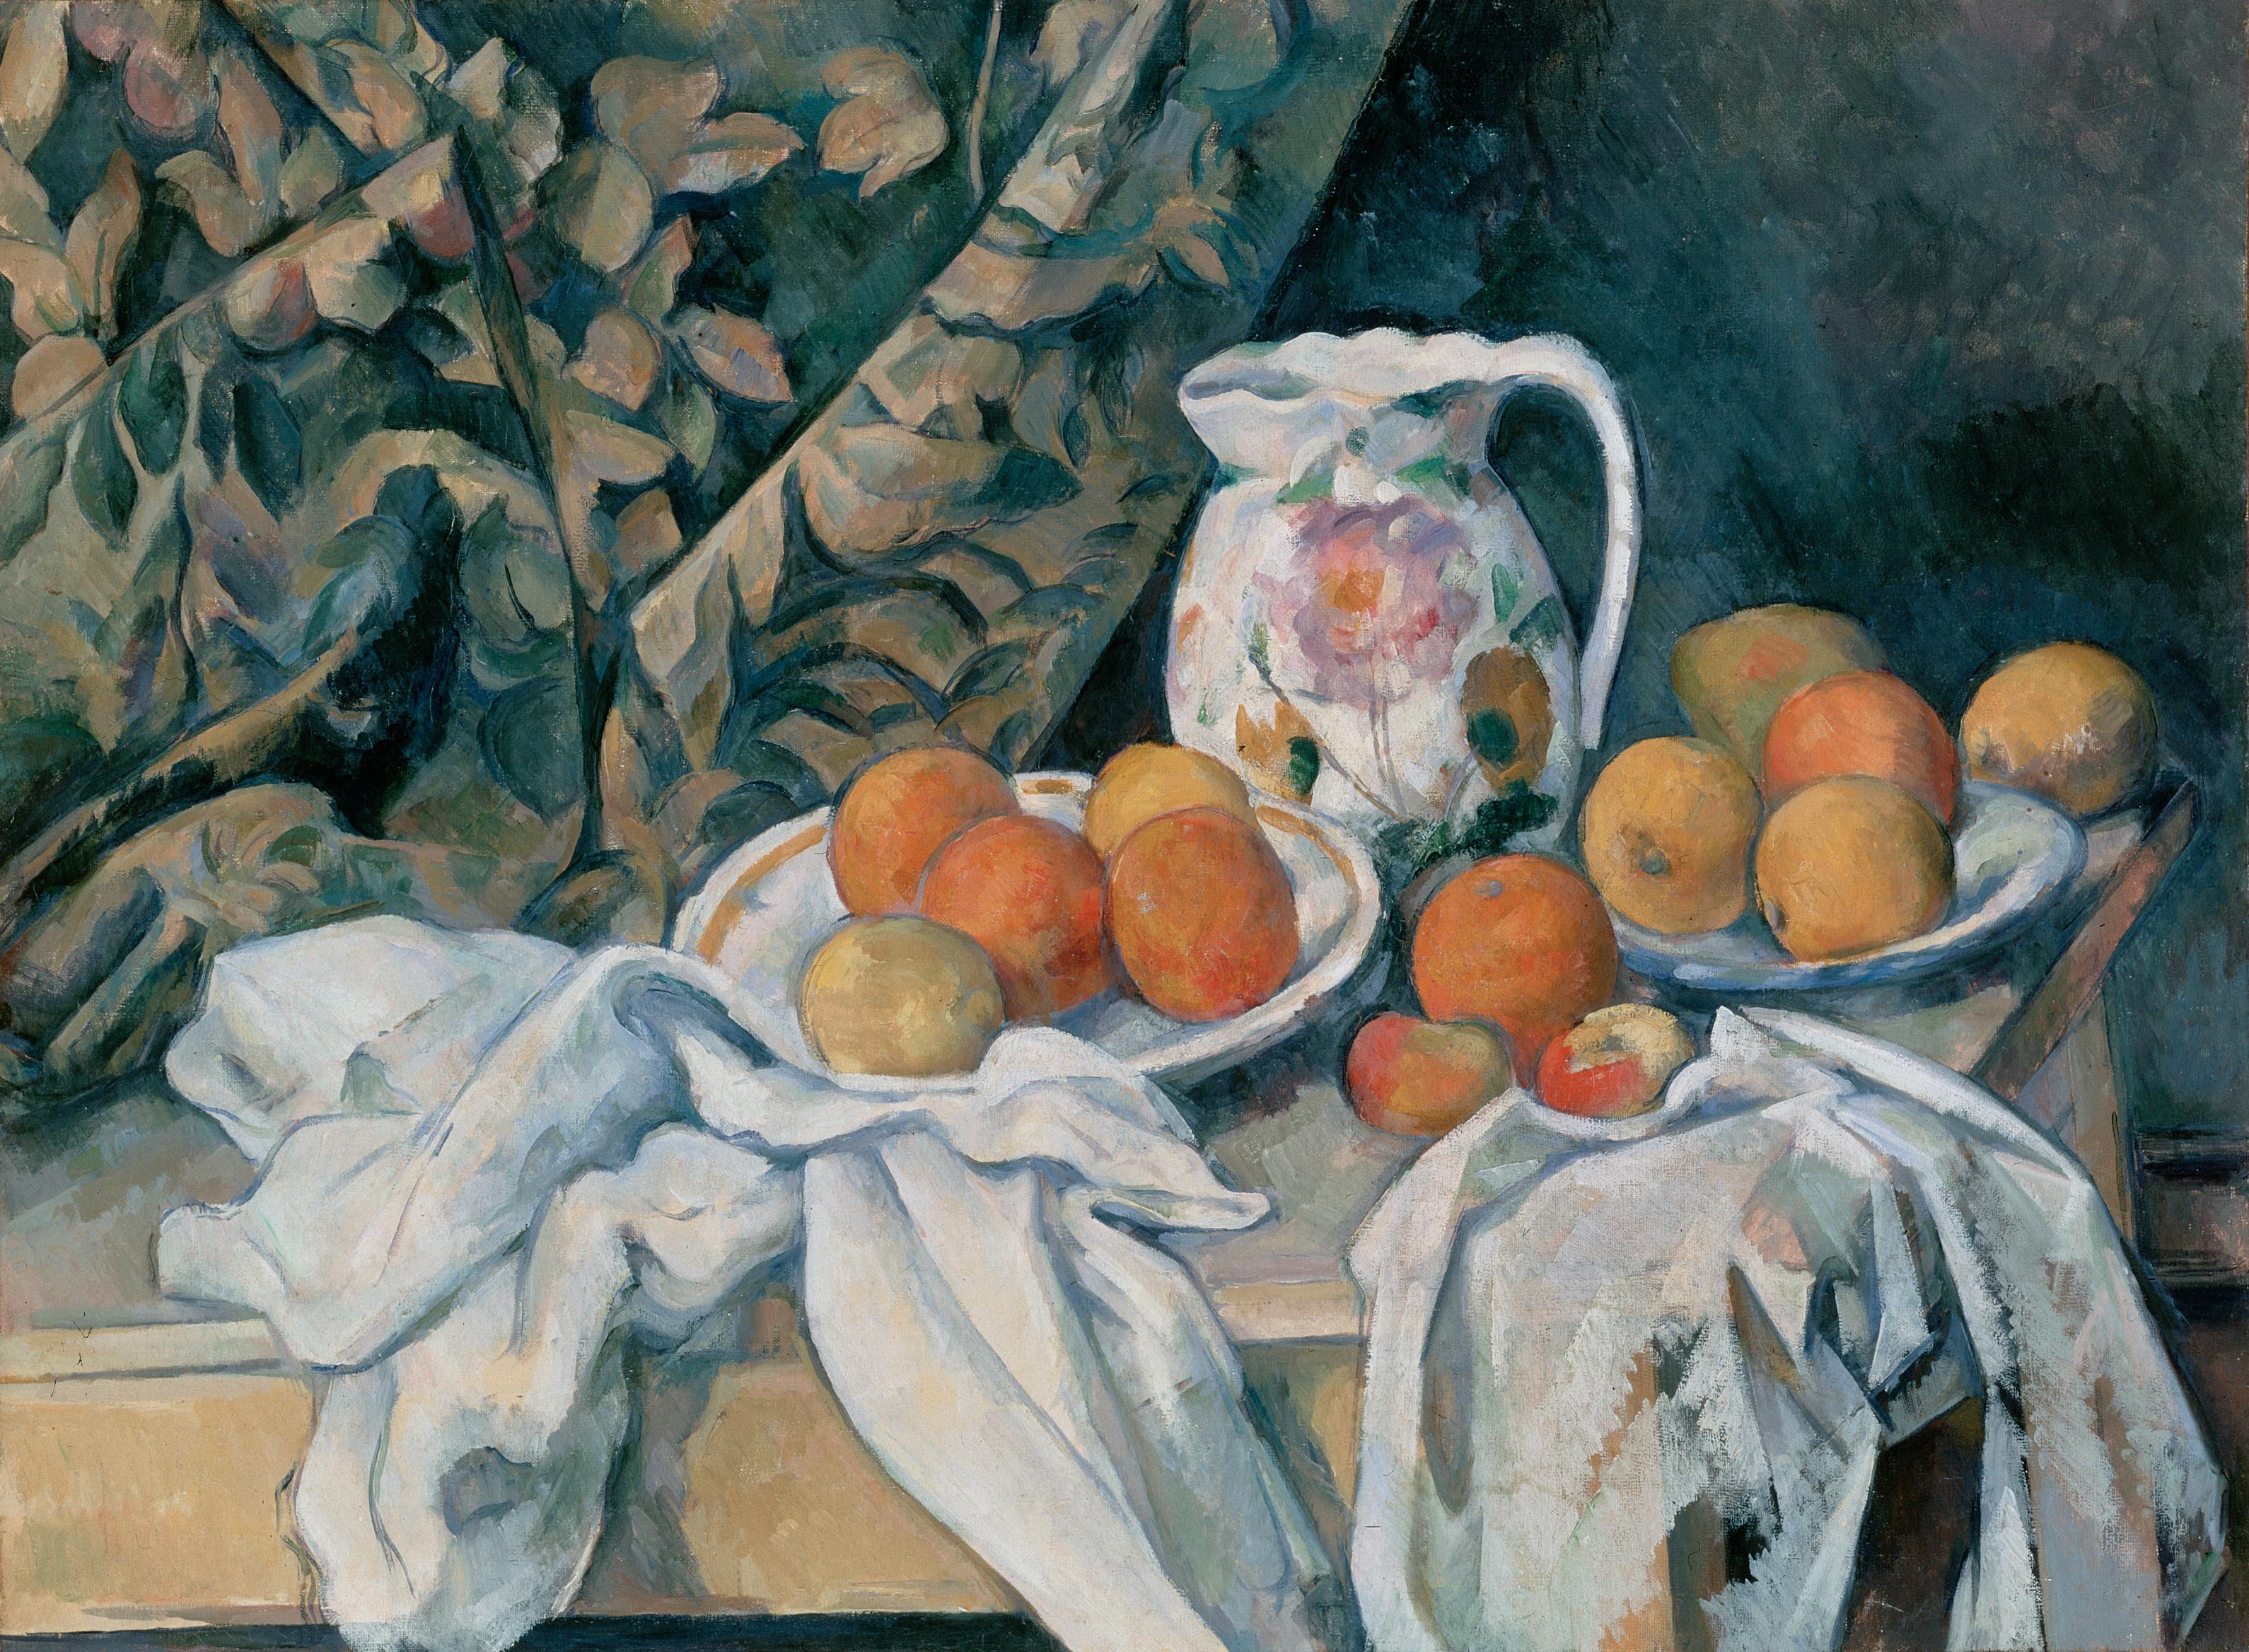 File:Cézanne, Paul - Still Life with a Curtain.jpg - Wikipedia, the ...: en.wikipedia.org/wiki/File:Cézanne,_Paul_-_Still_Life_with_a...